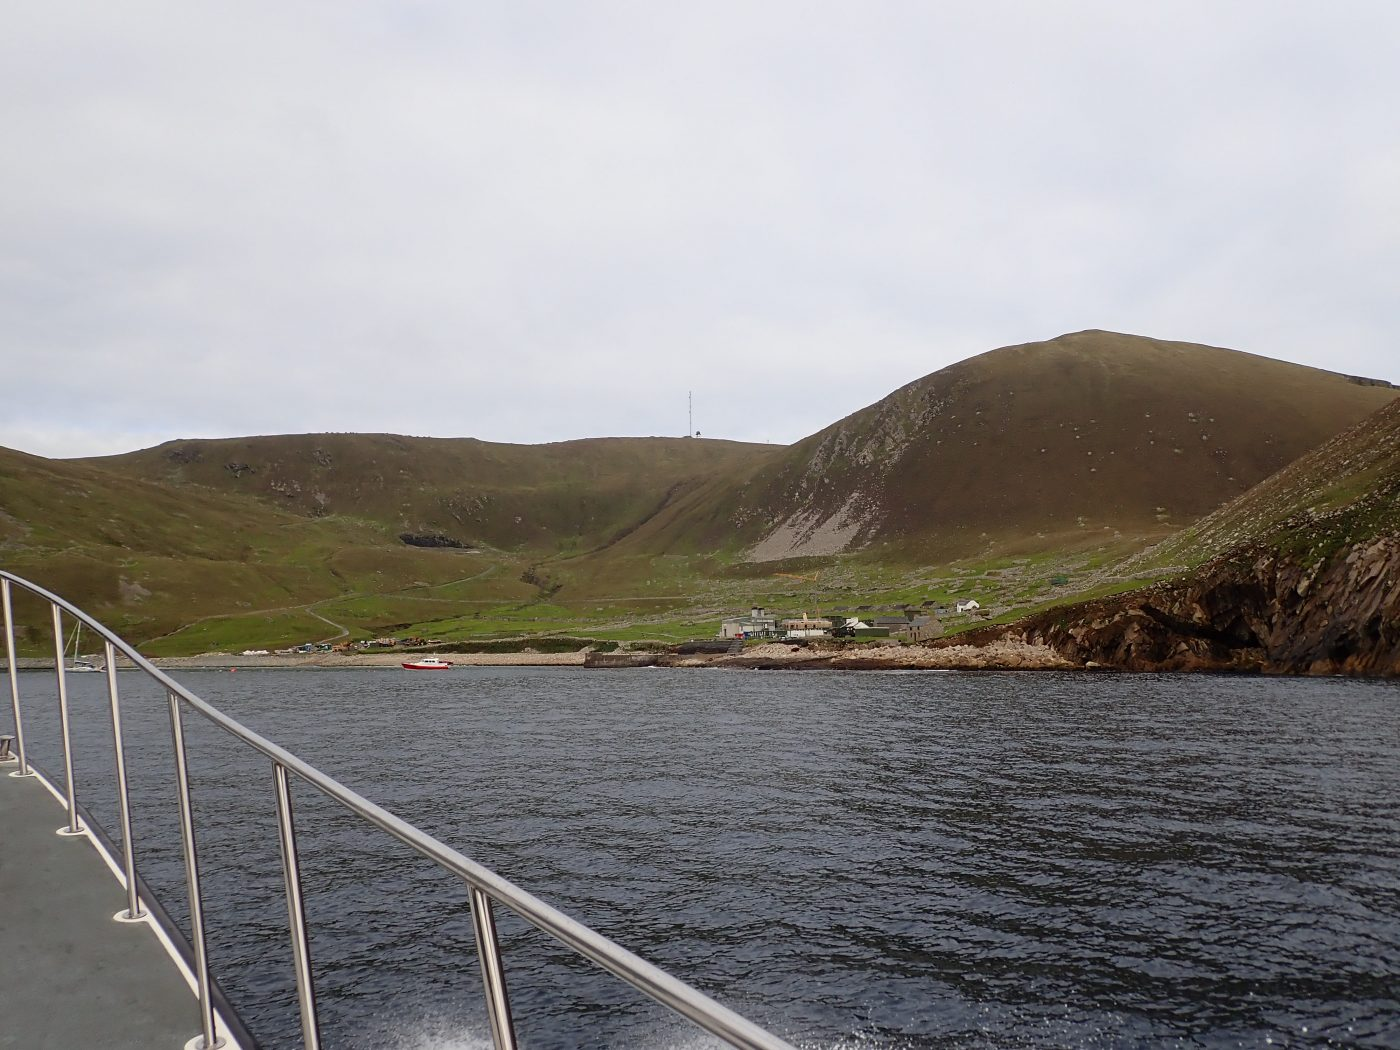 Scottish Islands Village Bay St Kilda arrival